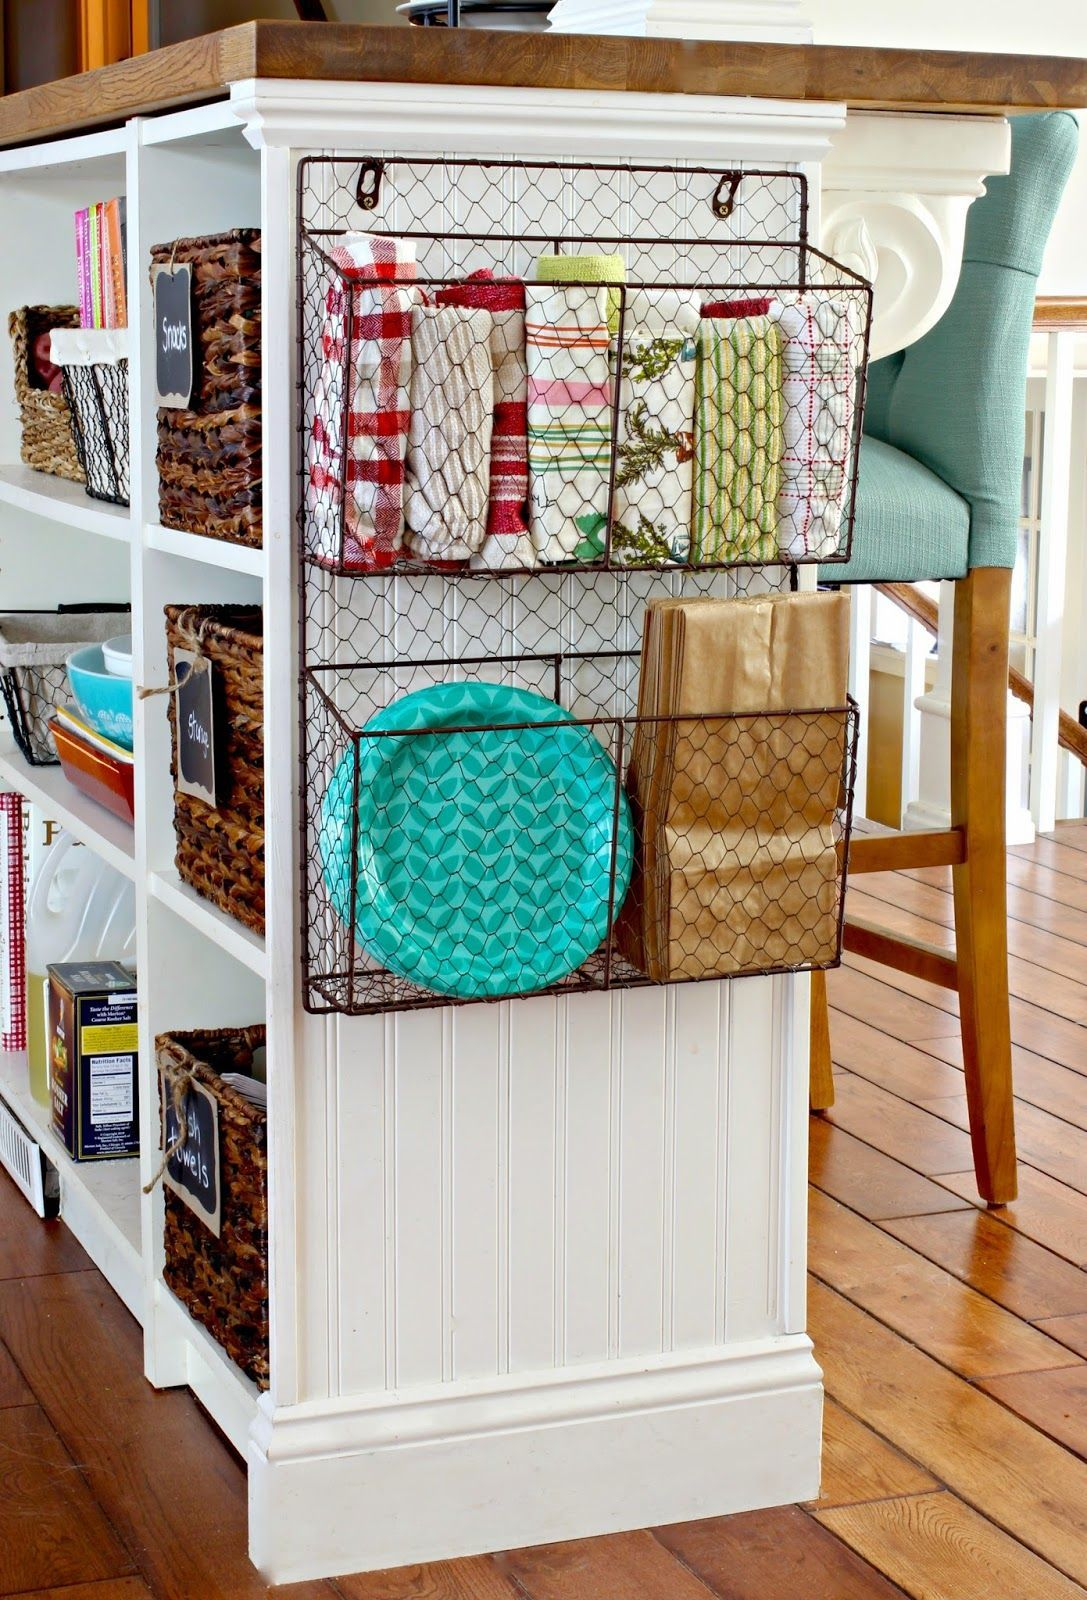 Superieur Hanging Wire Basket For Kitchen Storage. Ll Www.goldenboysandme.com